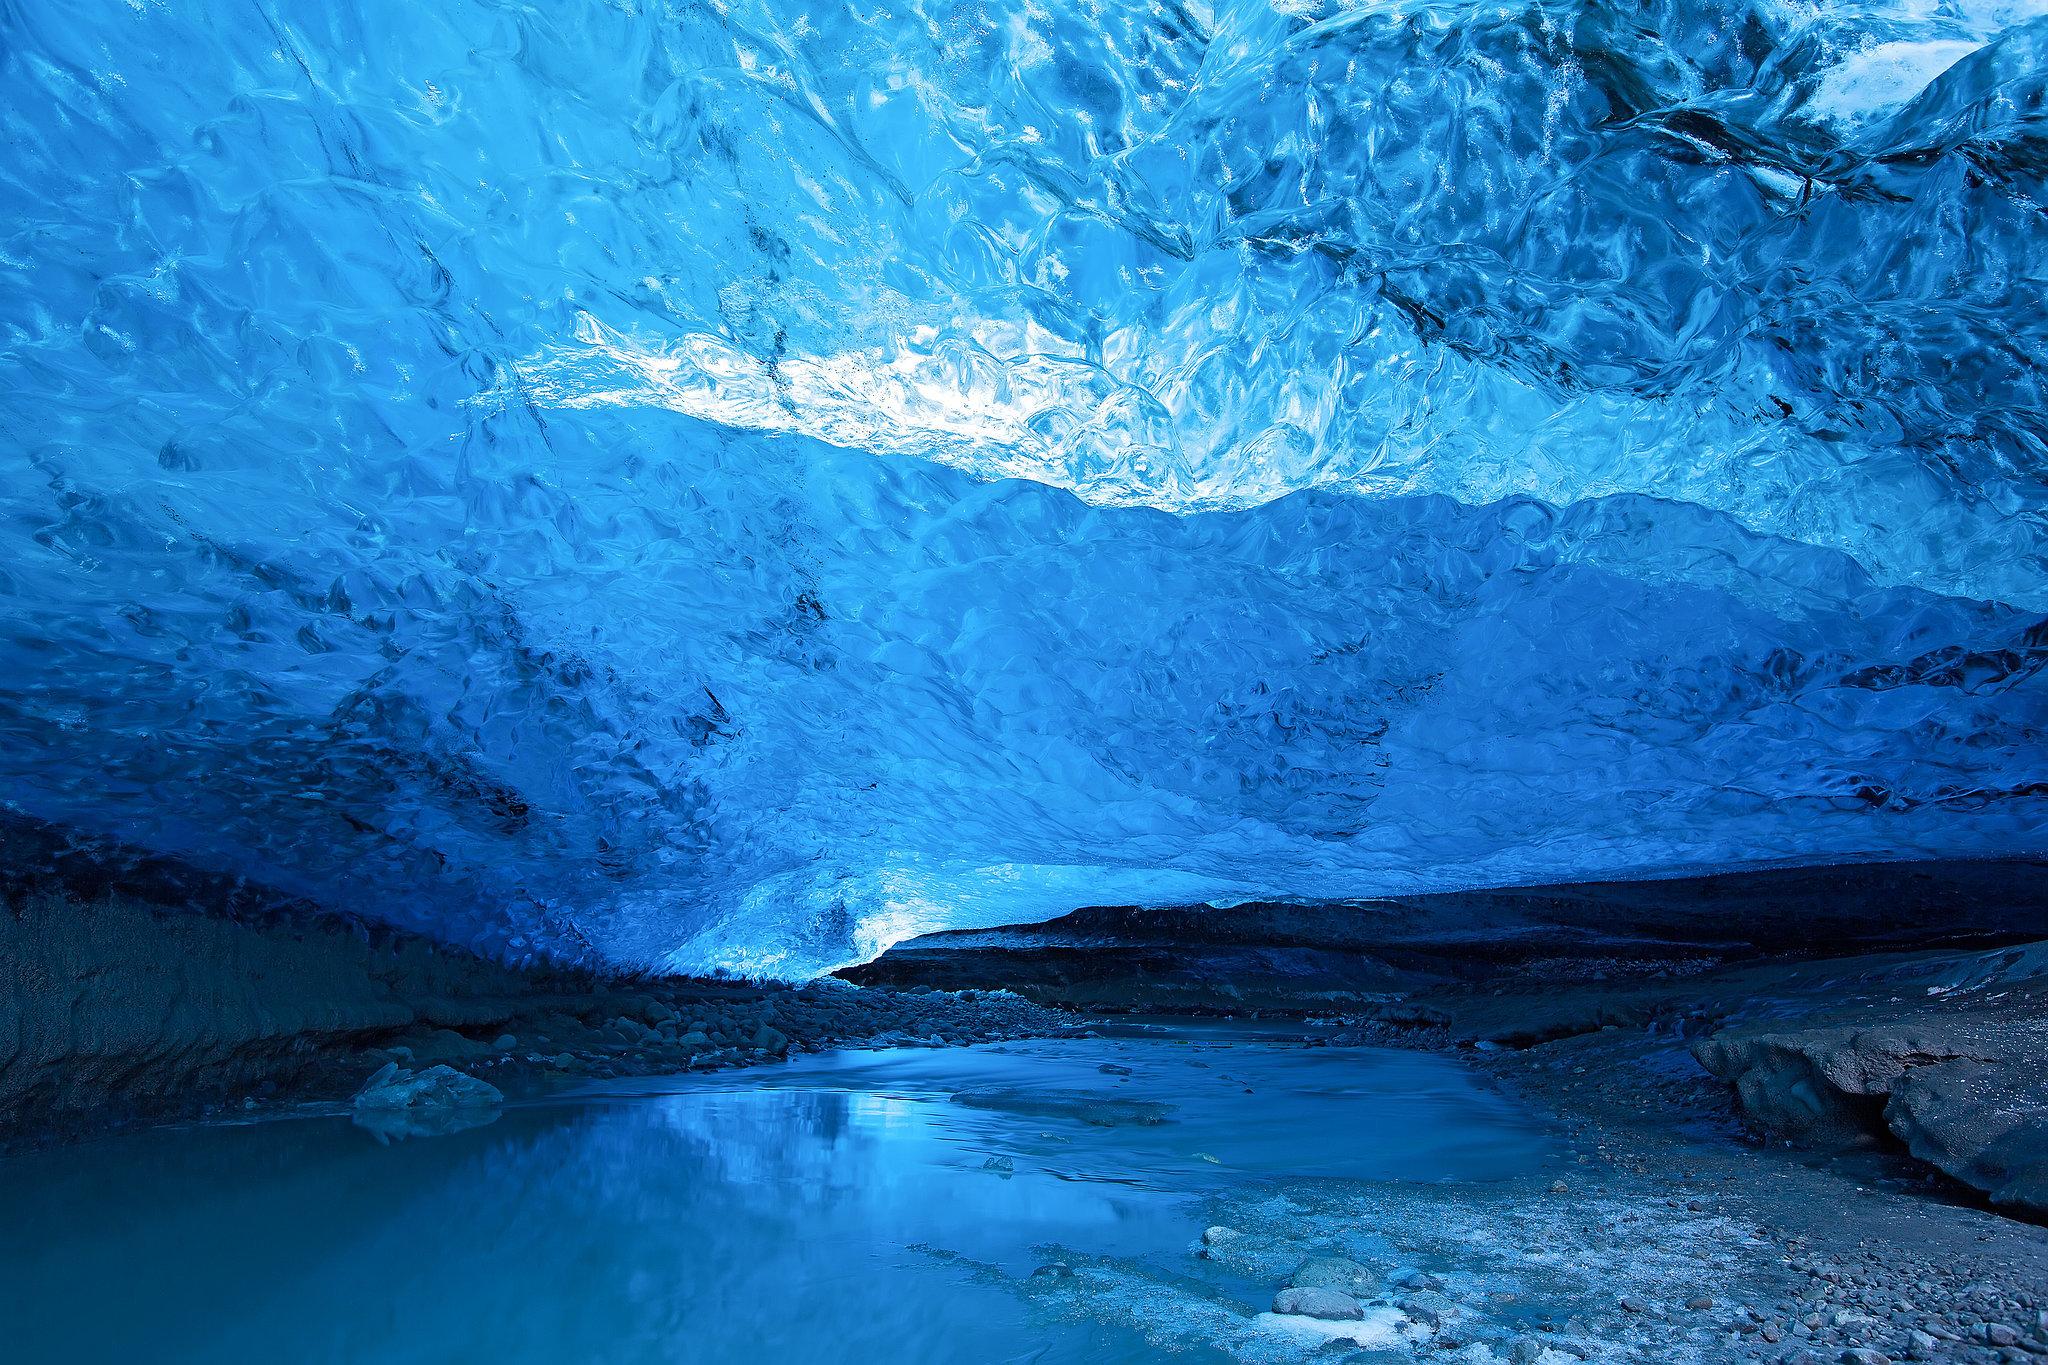 Glacier Ice Cave, Iceland